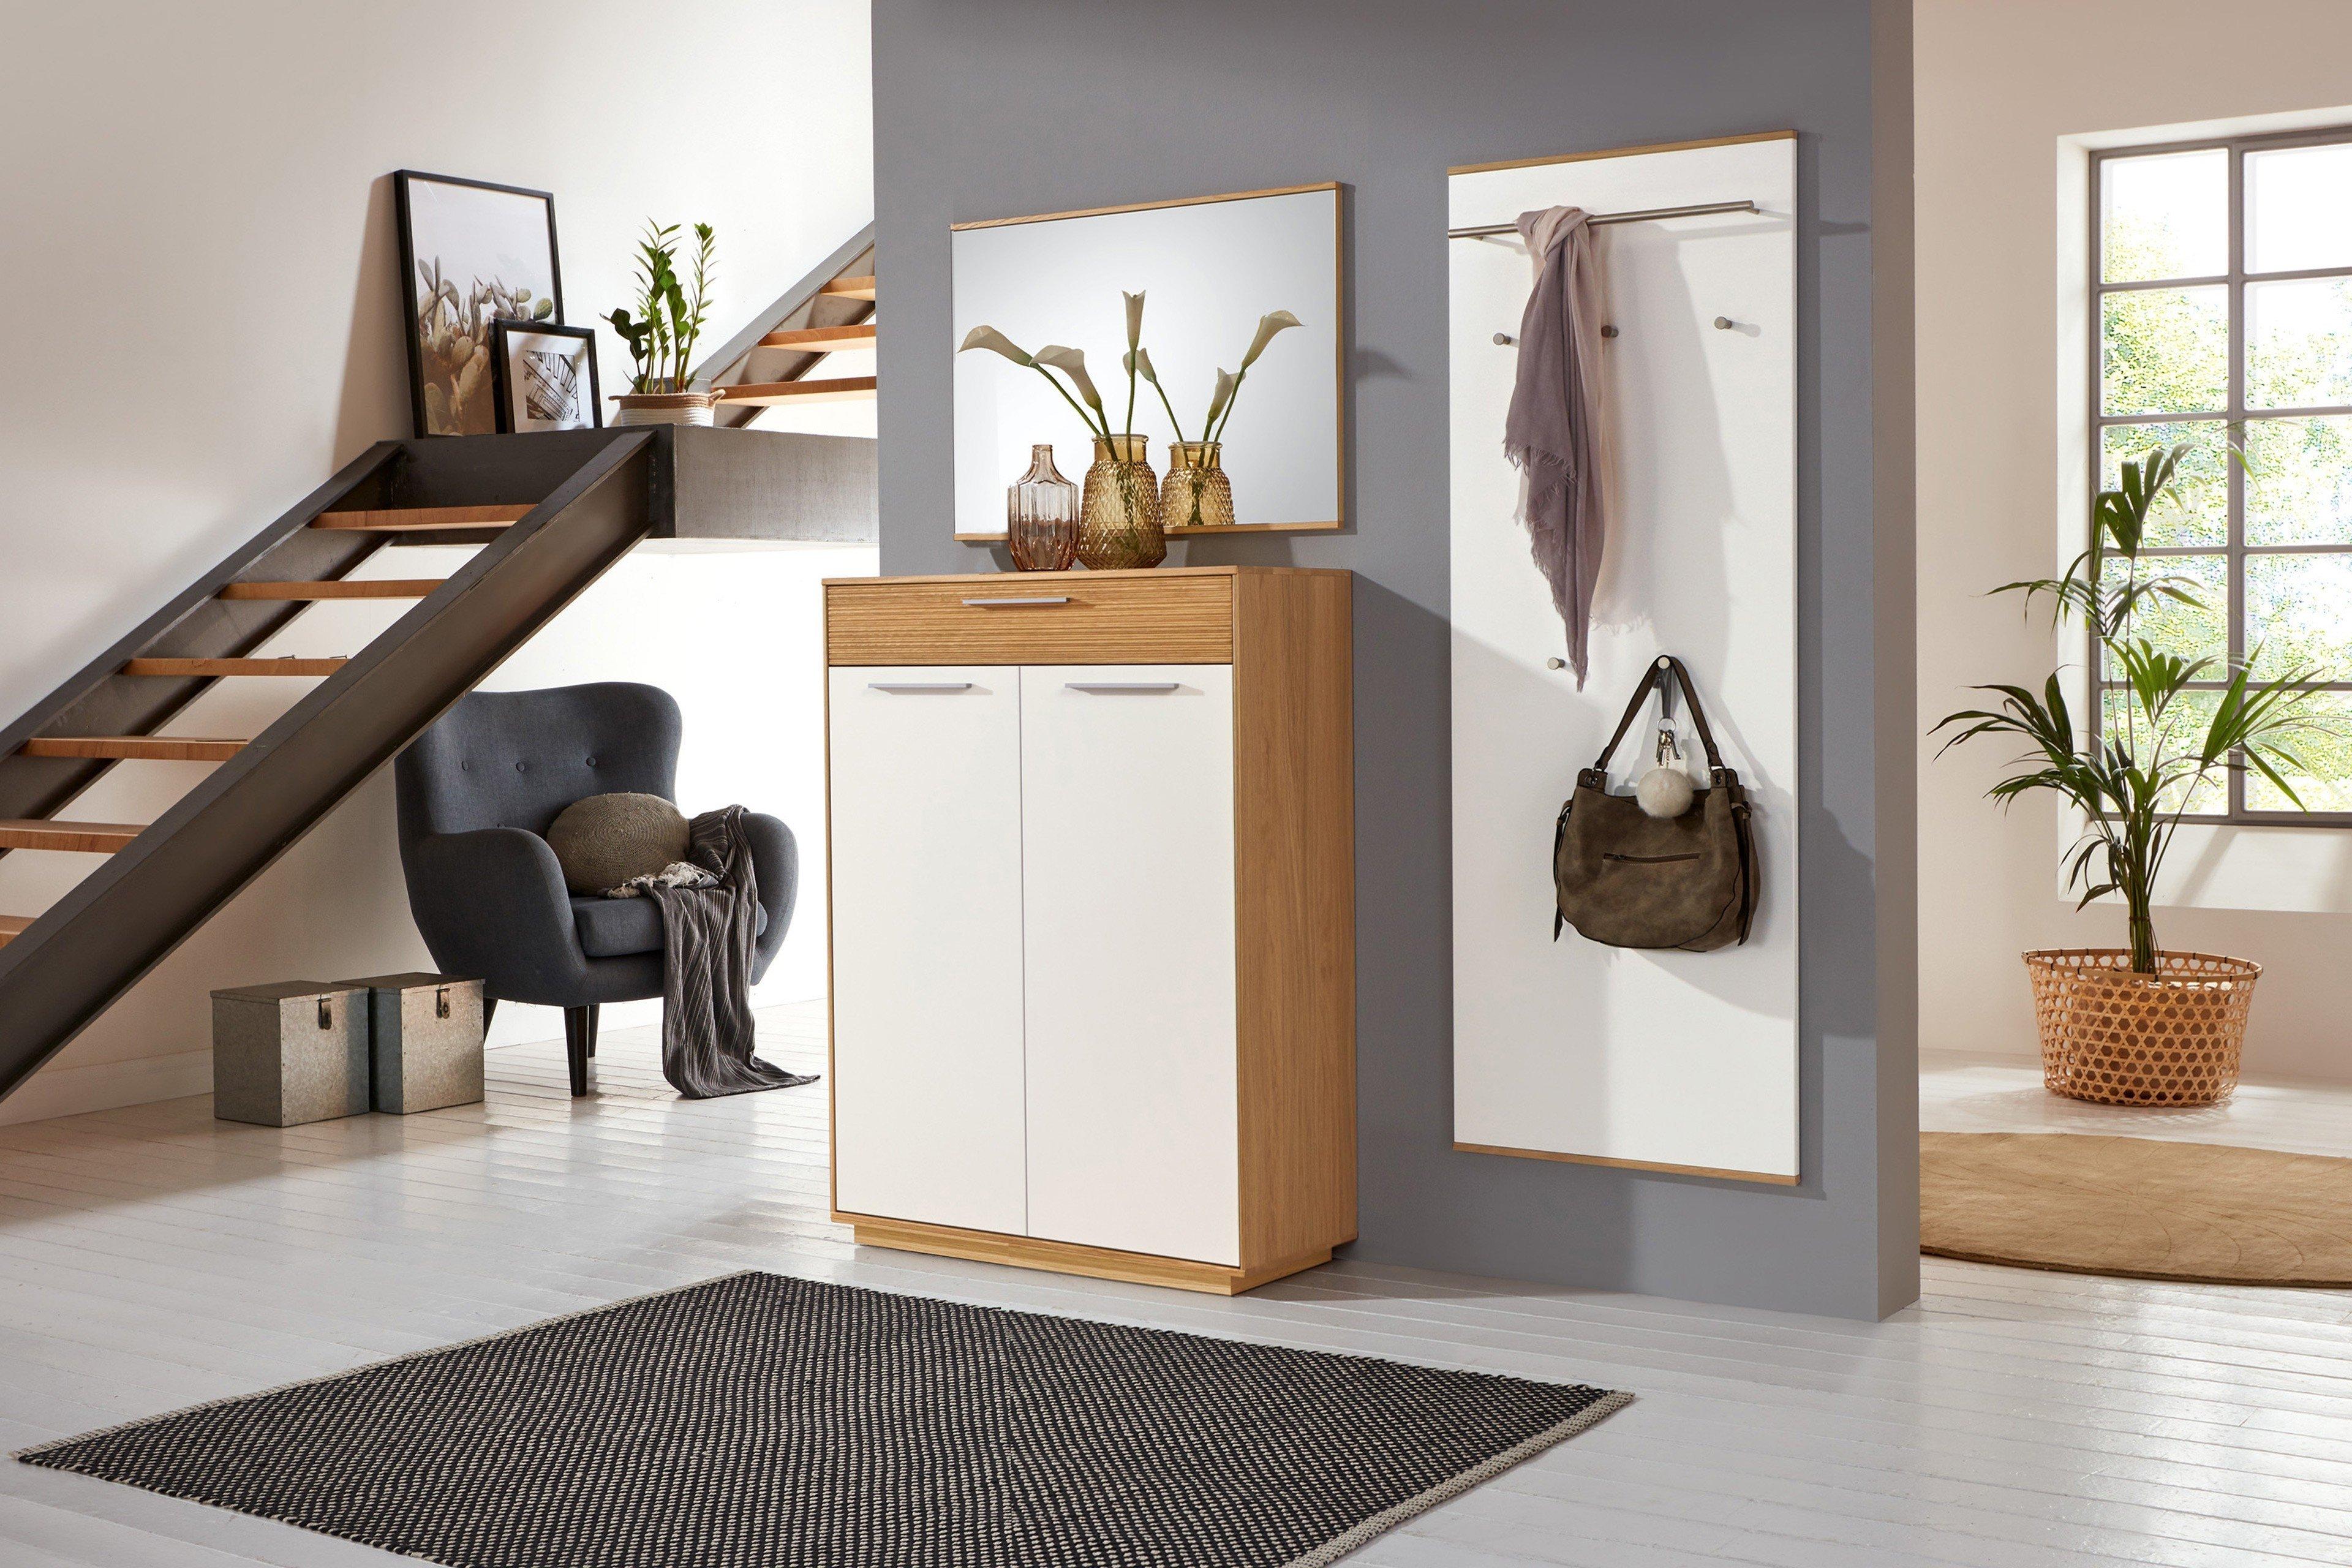 Garderobe Loveno V3 von Voss Möbel